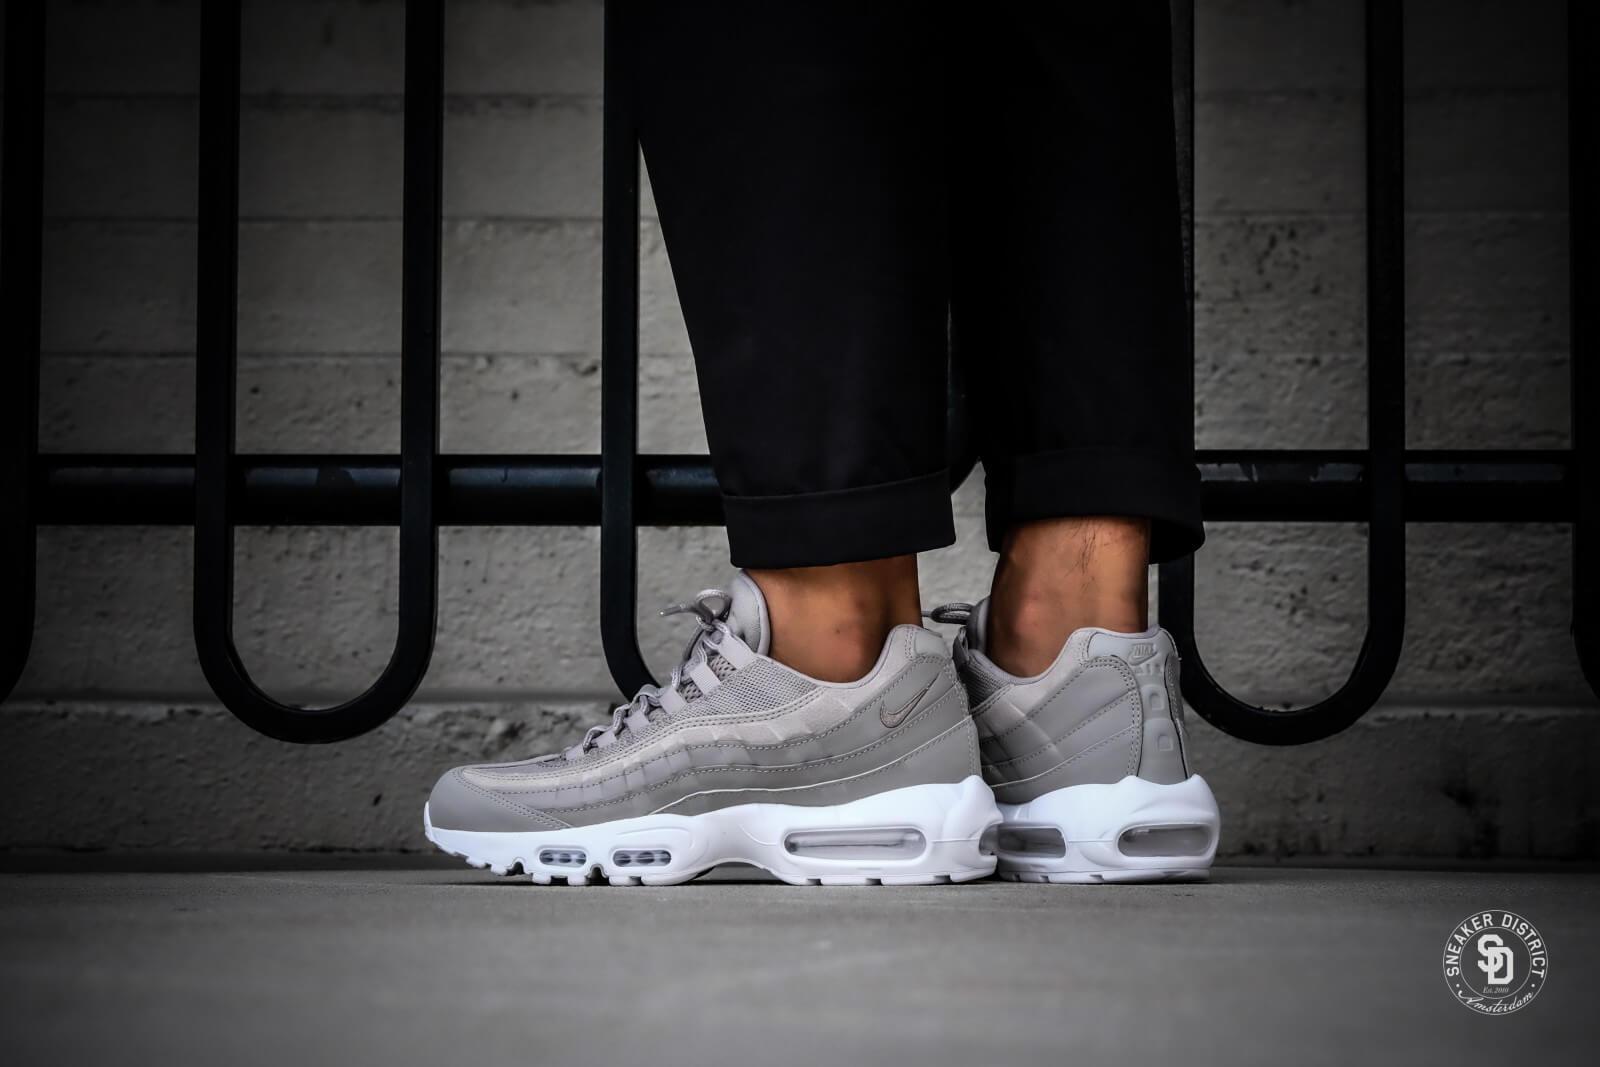 sports shoes e8595 44abe Nike Air Max 95 PRM Cobble Stone   White